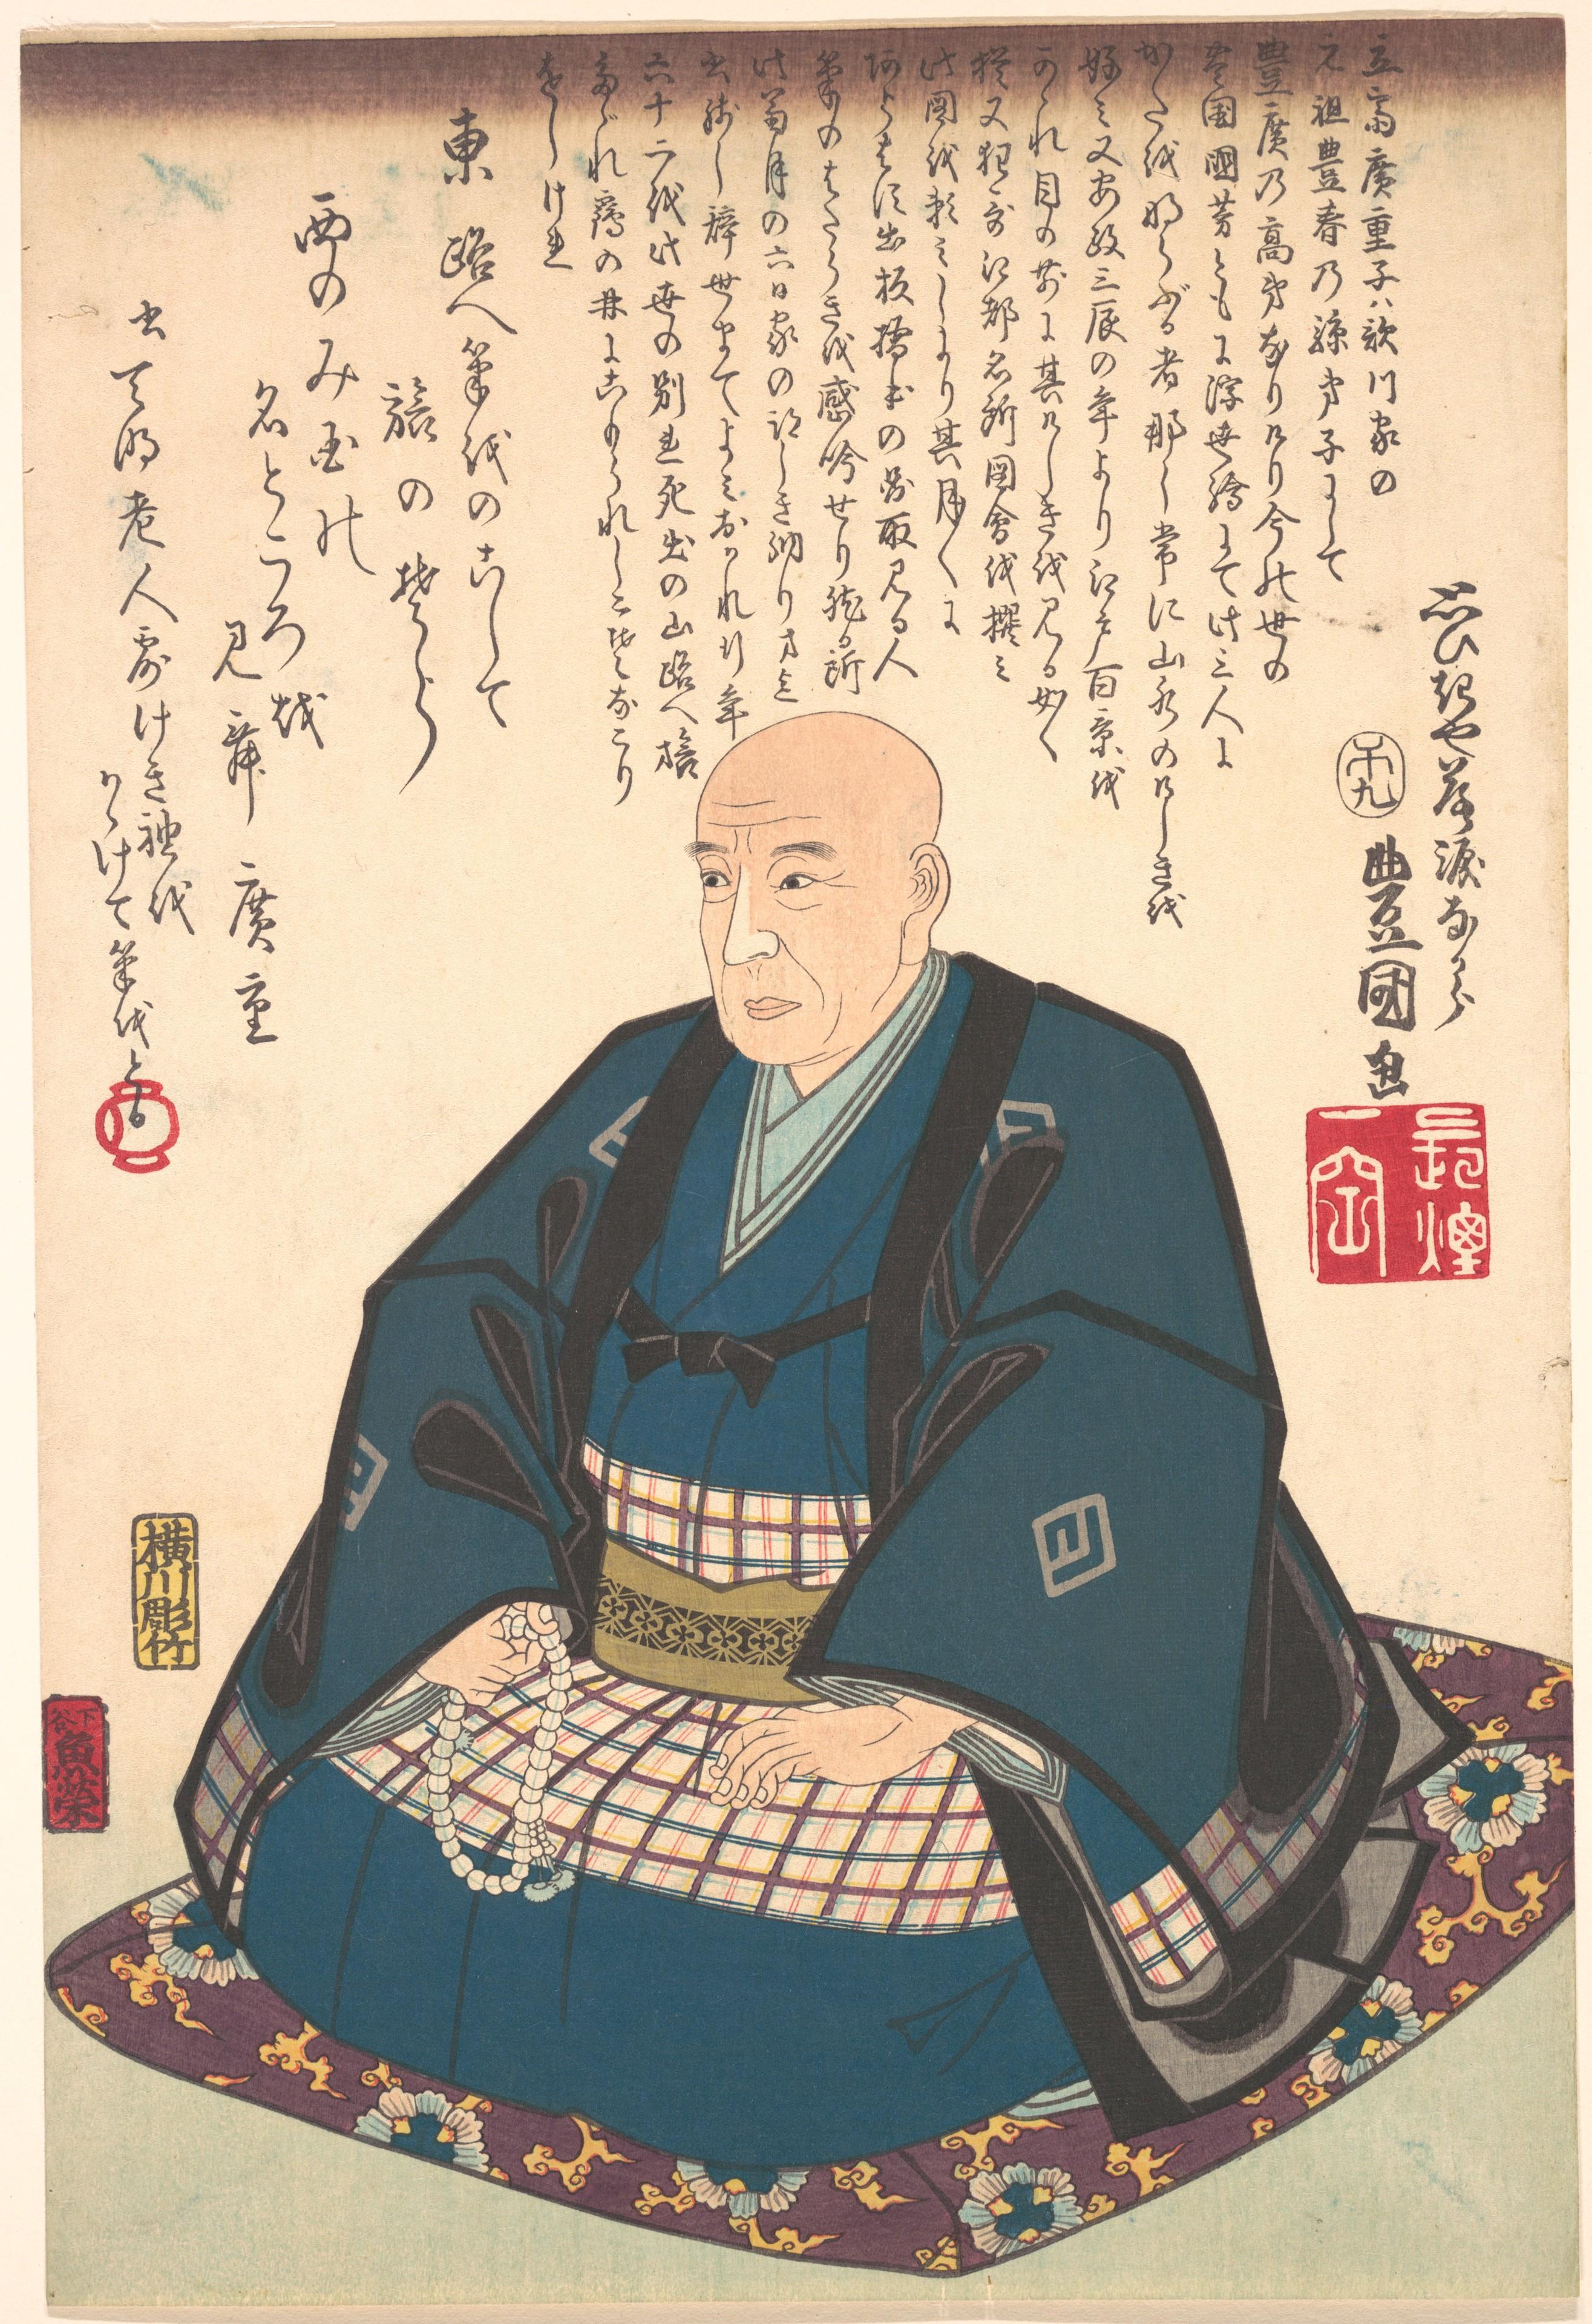 4 Japanese Scenes Woodblock 4 Print Set Mount Fuji in Snow Asakusa Temple New